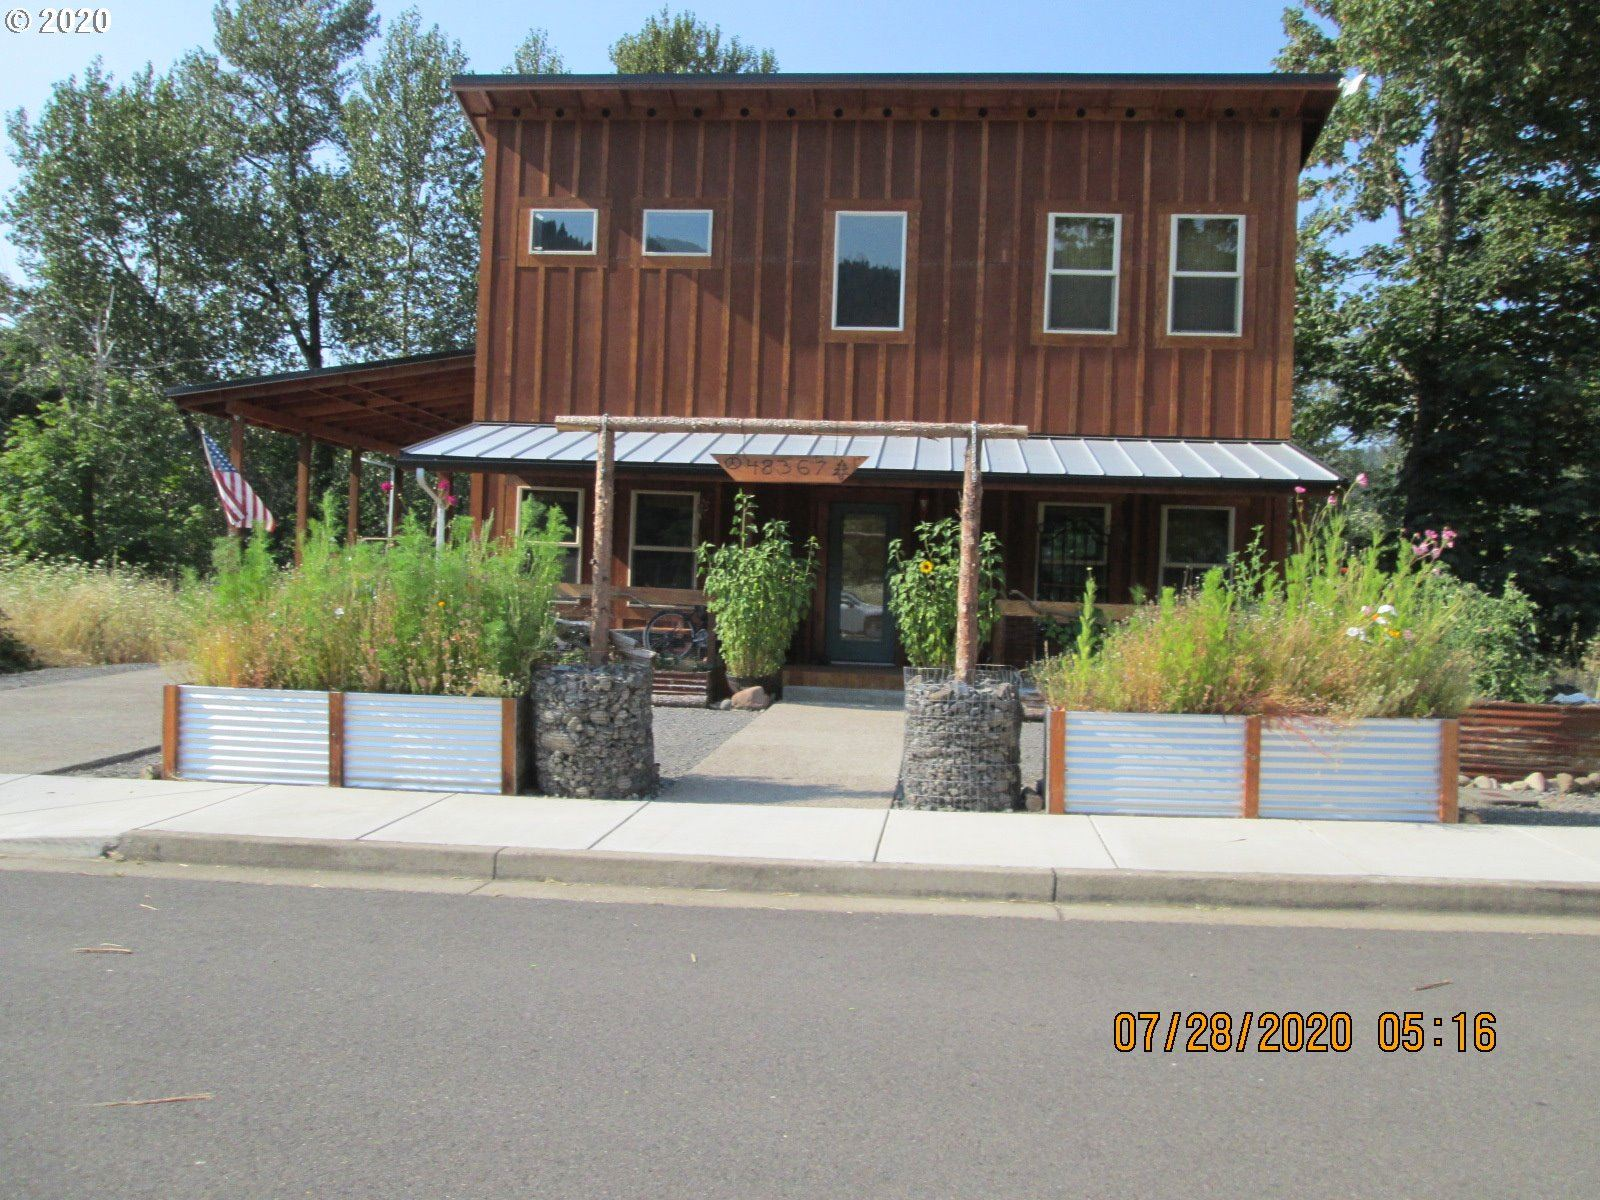 Photo for 48367 ROARING RAPIDS WAY, Oakridge, OR 97463 (MLS # 20128326)